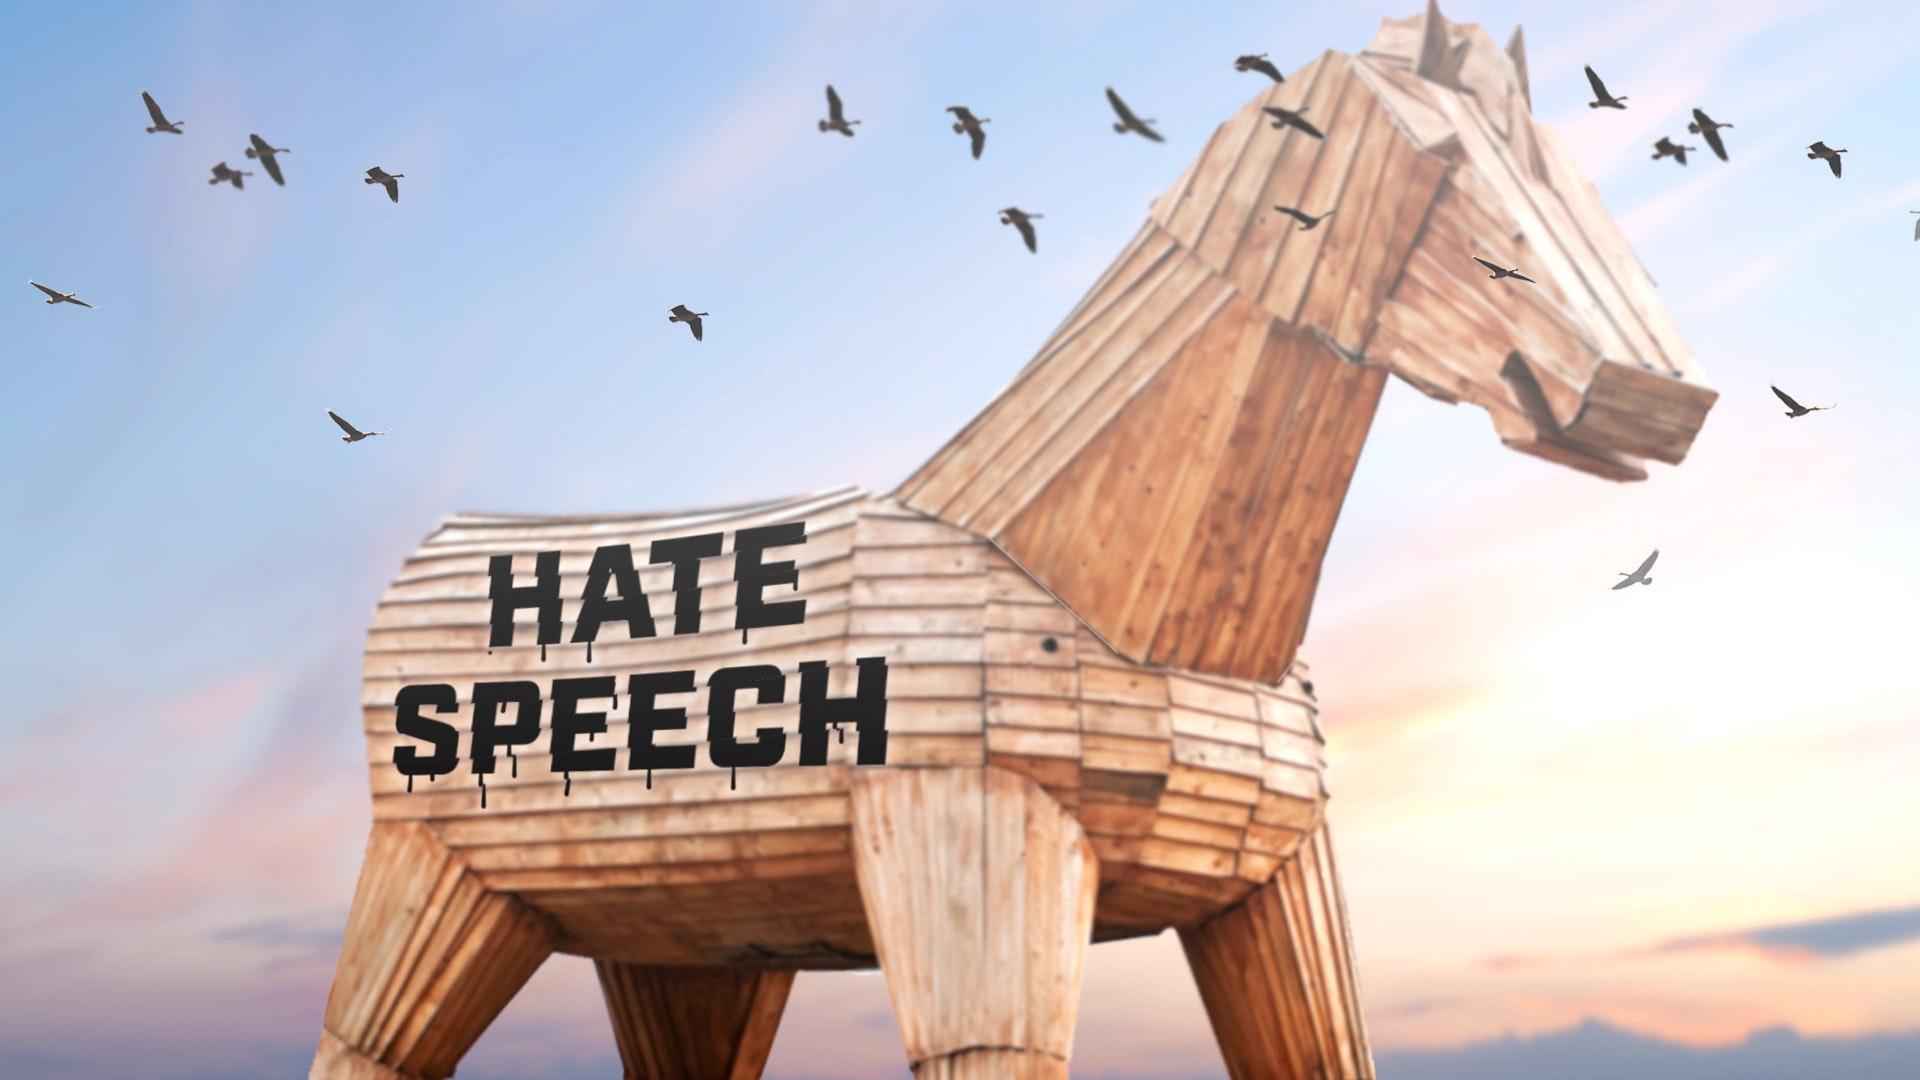 Ep. 650 - The 'Hate Speech' Trojan Horse